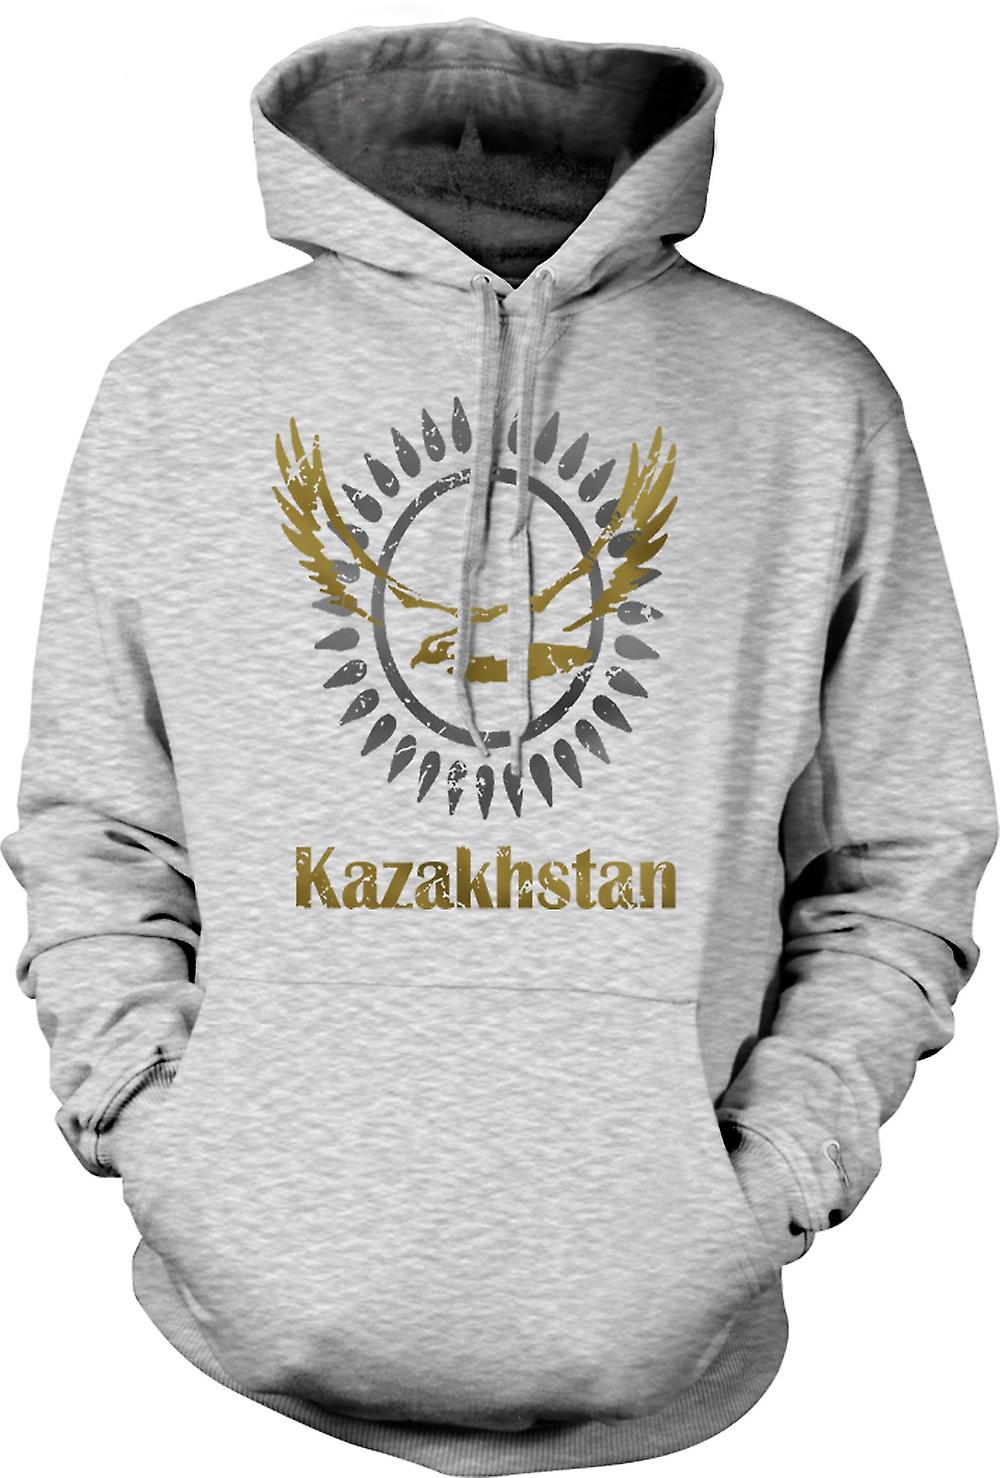 Mens Hoodie - Kazakhstan - freddo di disegno divertente